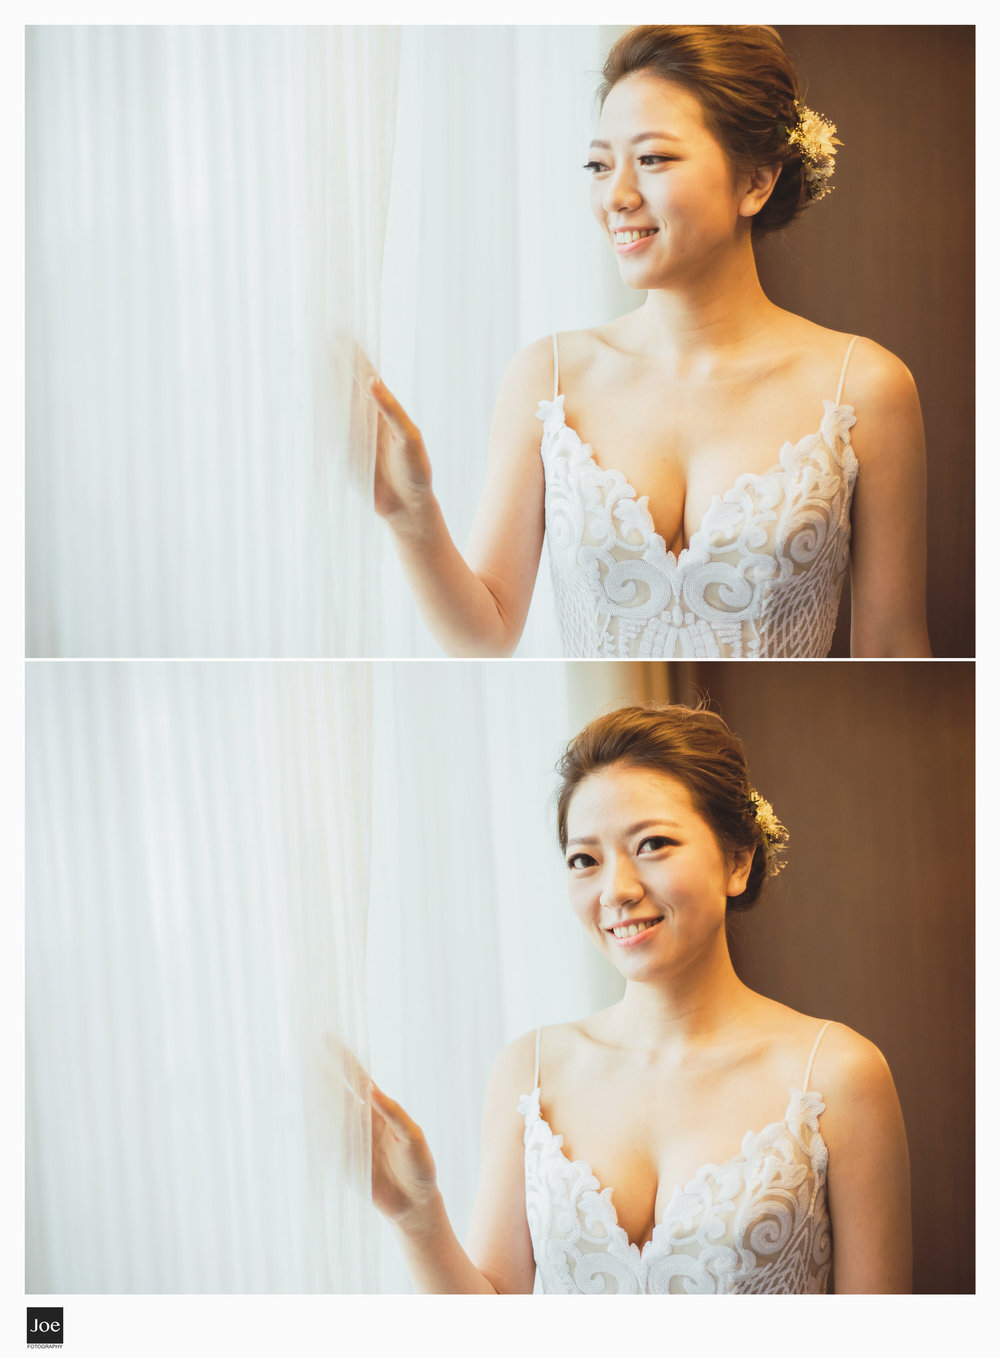 wedding-photography-shangri-la-far-eastern-plaza-hotel-ariel-sam-joe-fotography-015.jpg